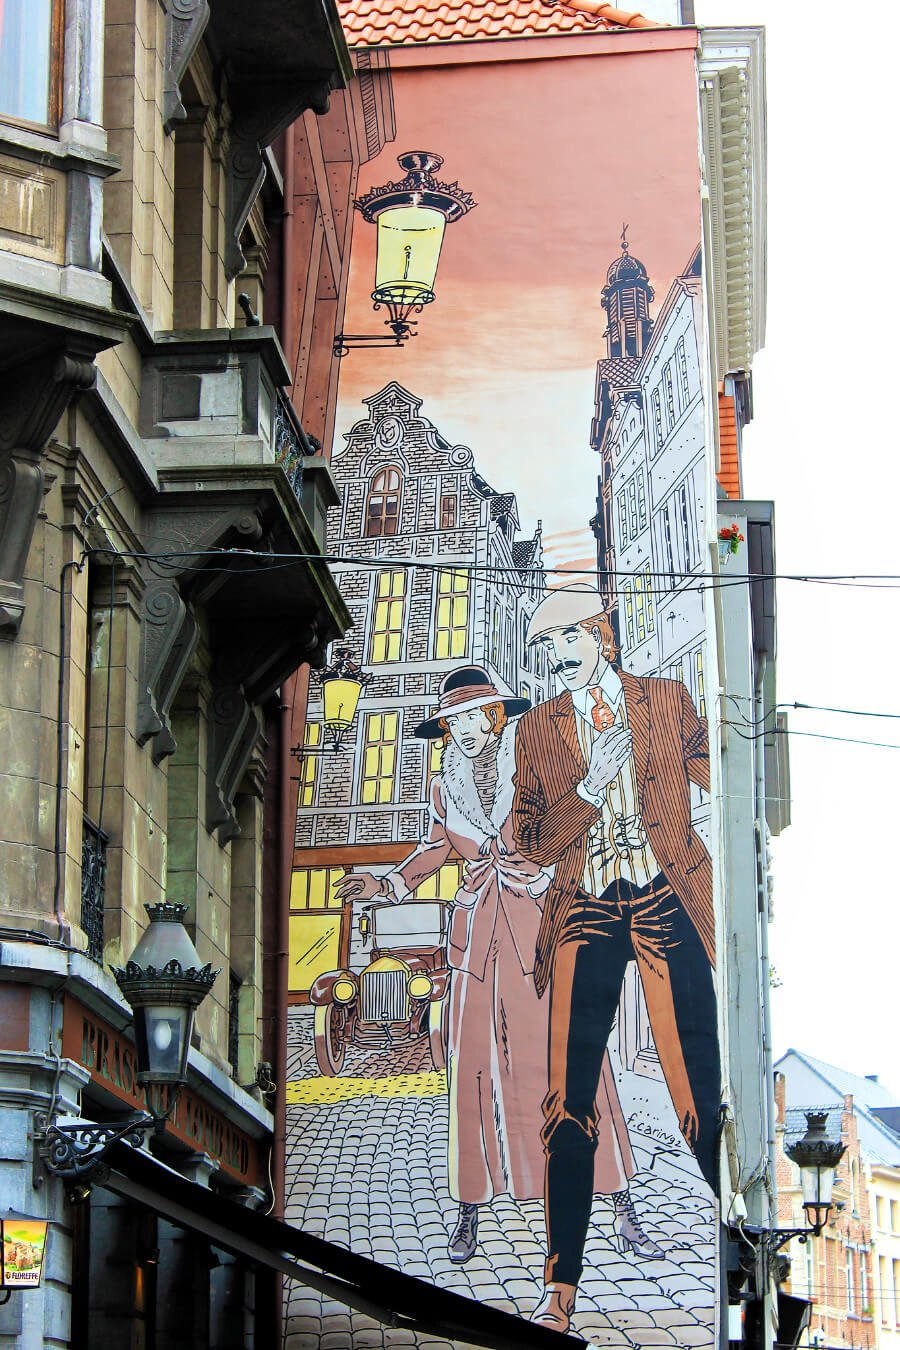 Comic book style street art in Brussels, Belgium